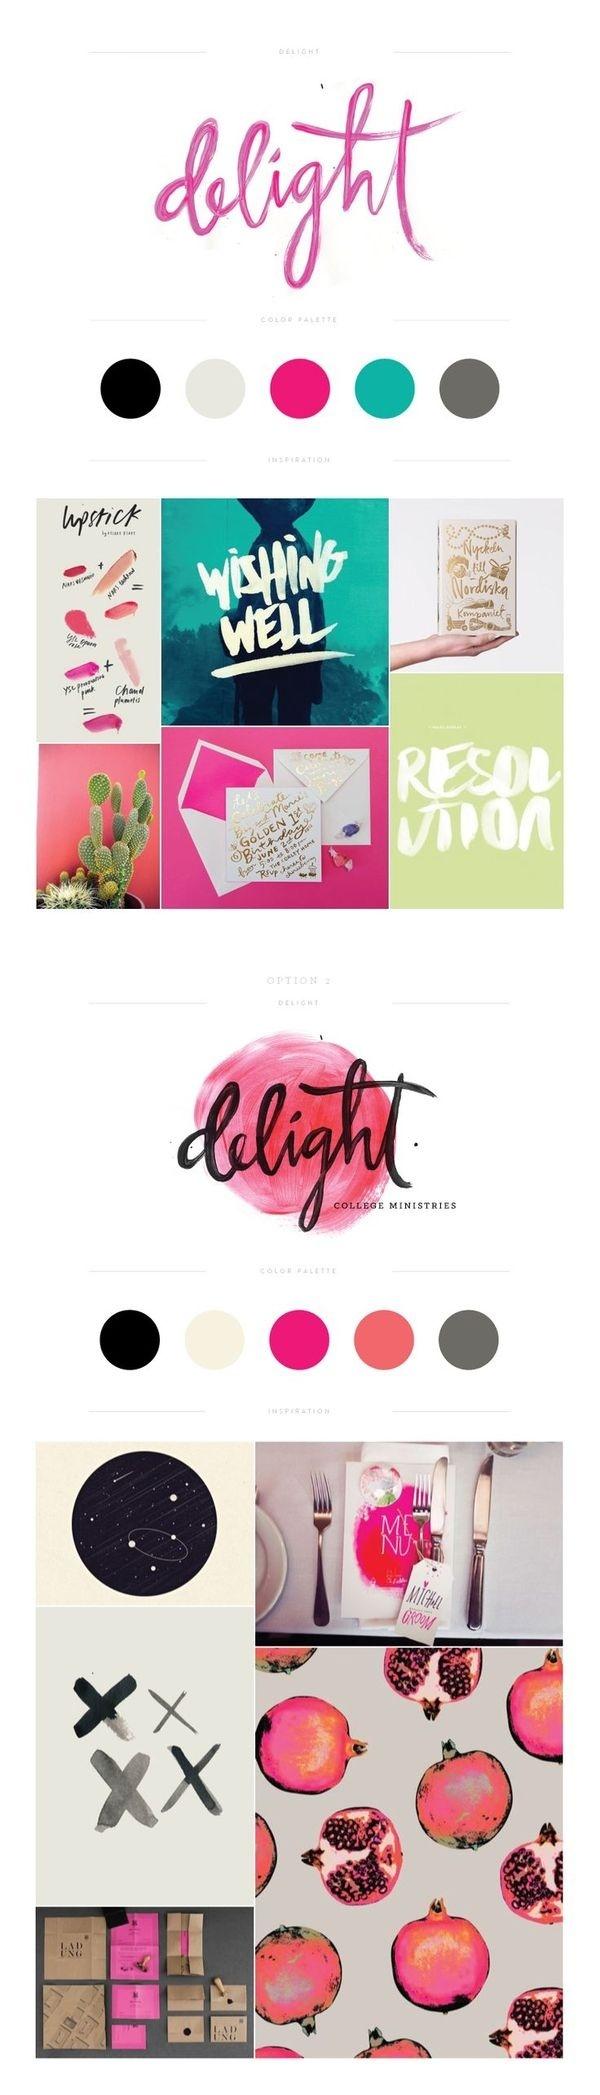 Delight Branding by Lauren Ledbetter Design & Styling #design #drawn #type #watercolor #hand